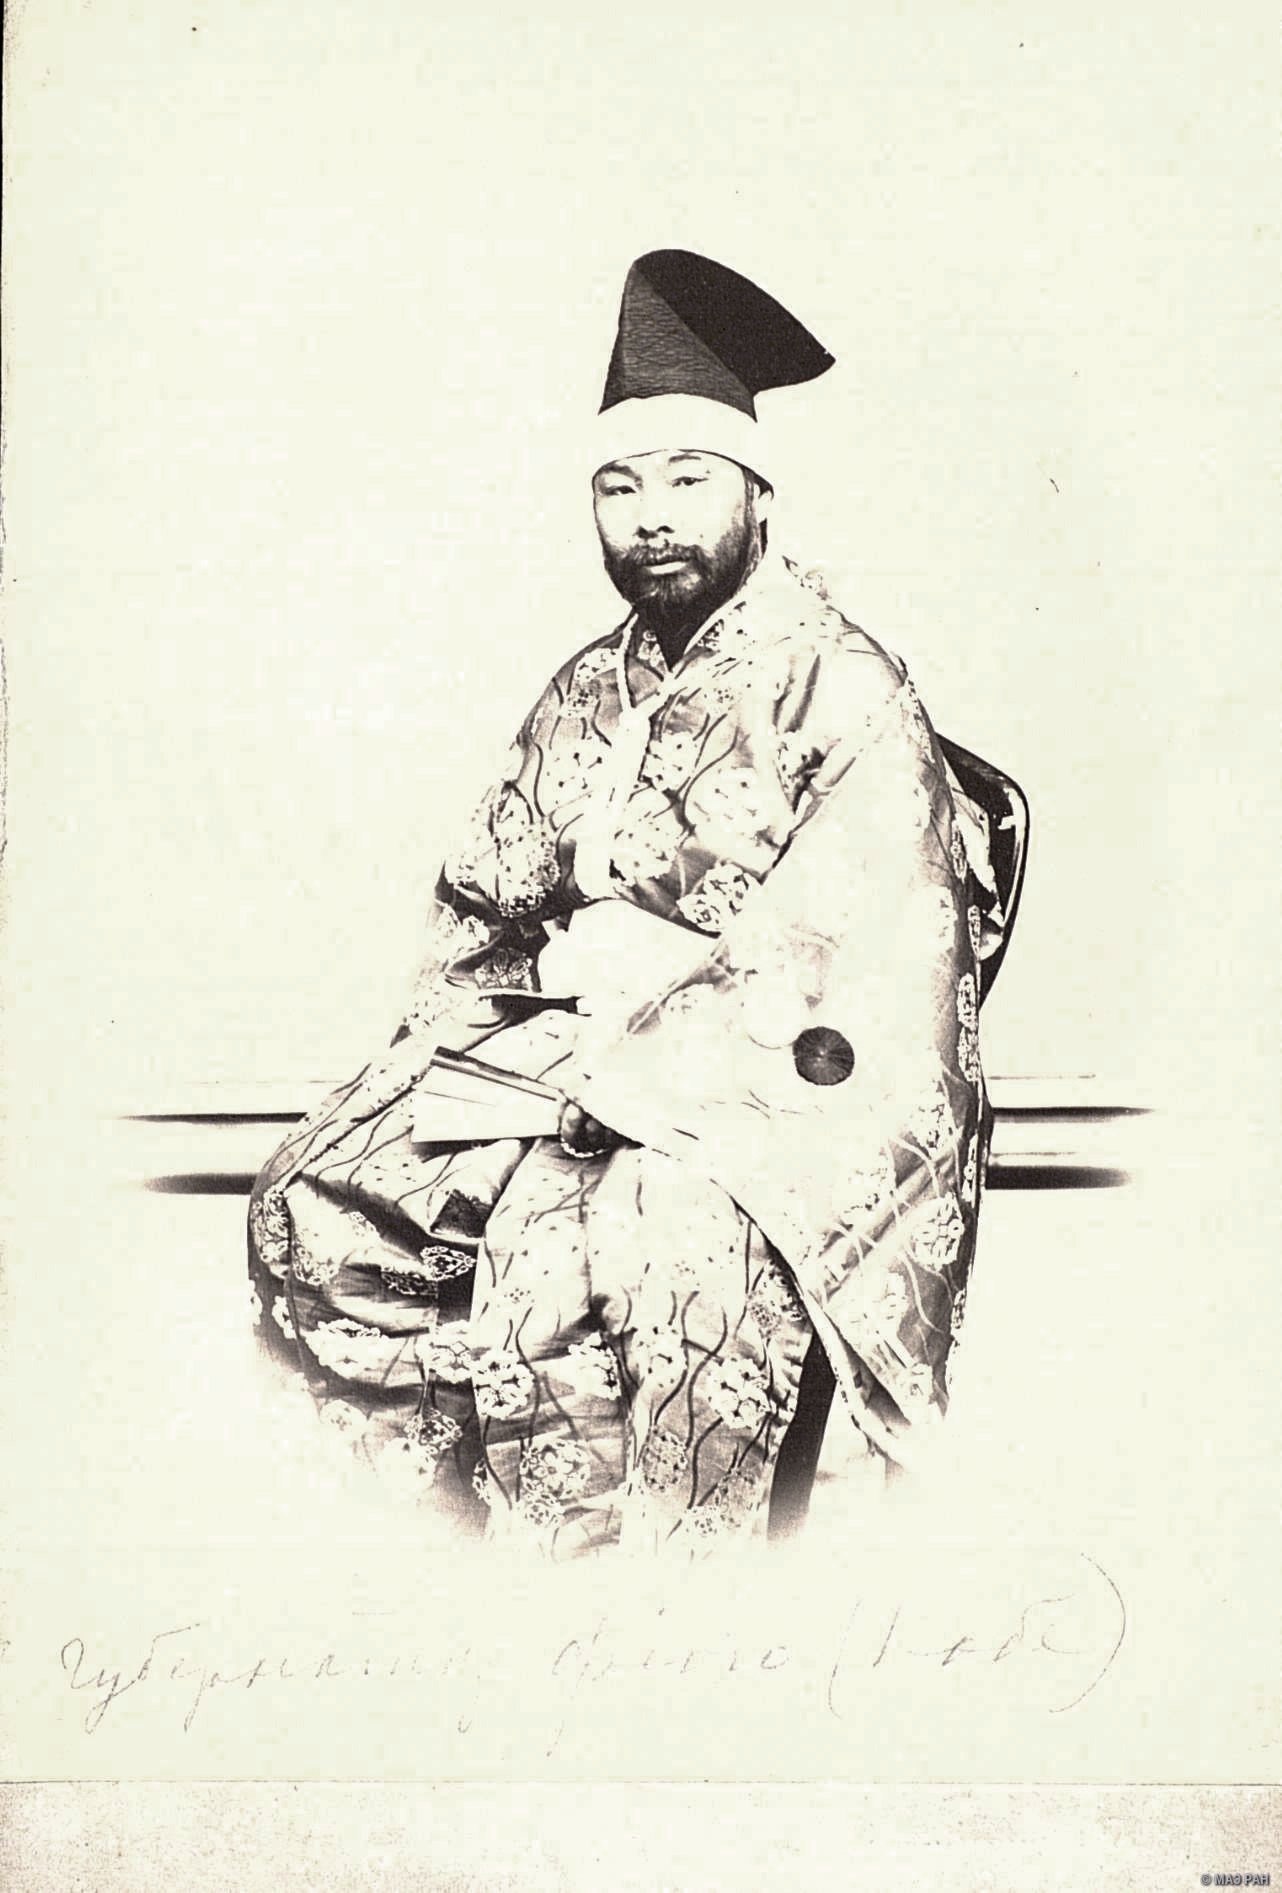 Портрет губернатора Хёго - Кохея Канда